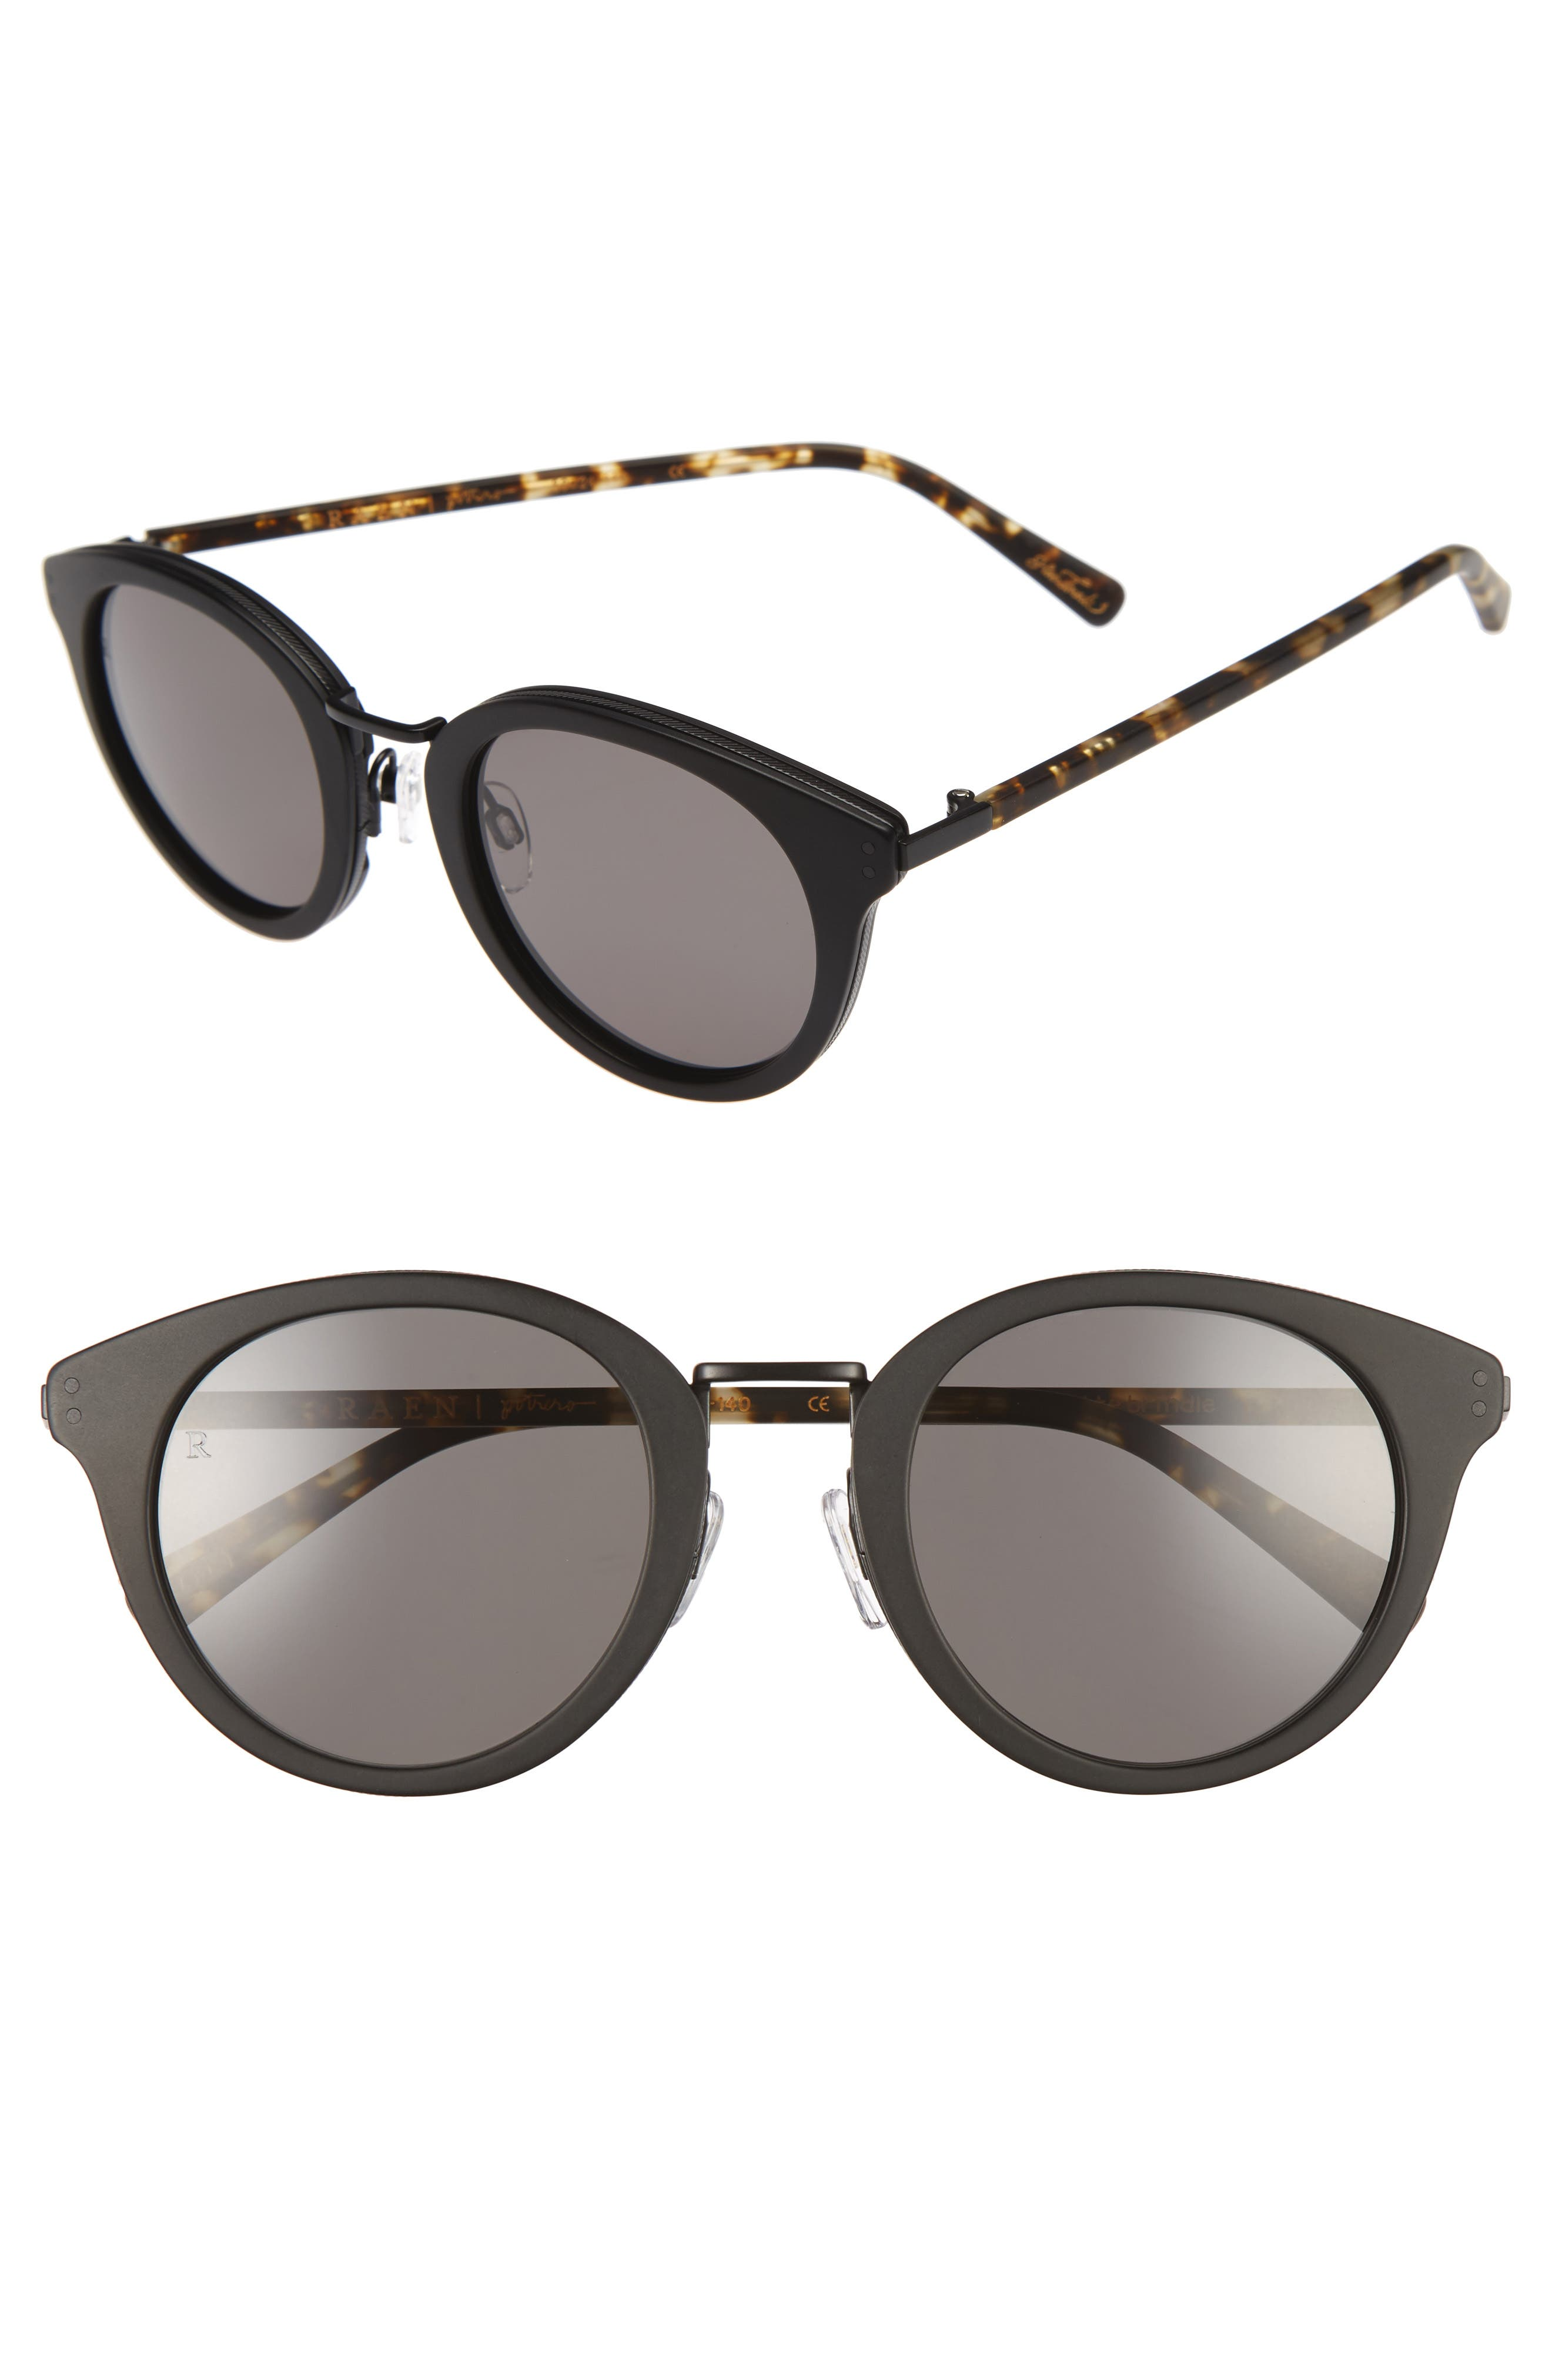 Potrero 50mm Sunglasses,                             Main thumbnail 1, color,                             001